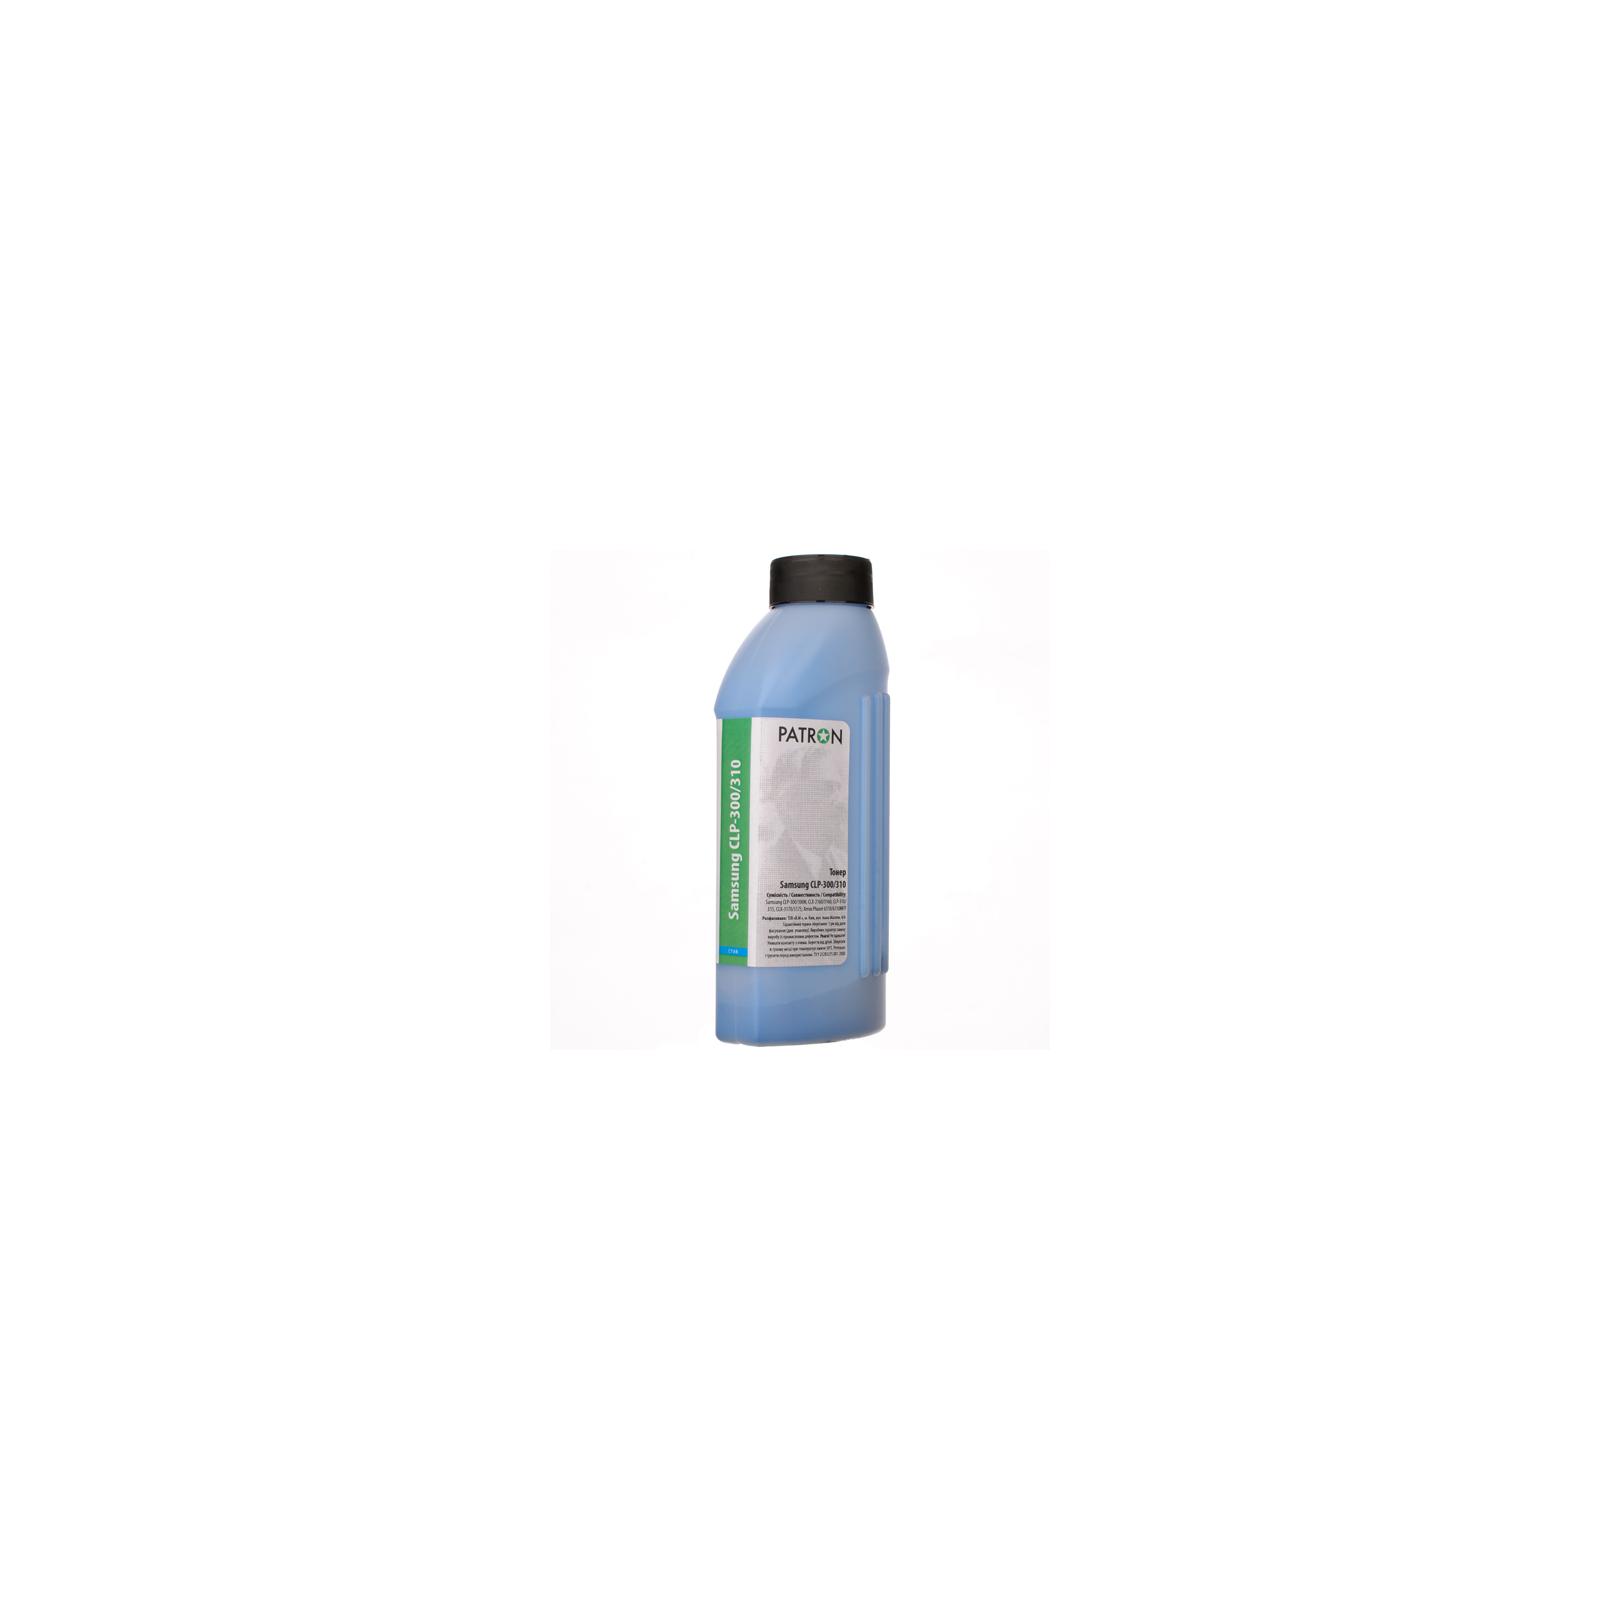 Тонер PATRON SAMSUNG CLP-300/310 CYAN 40г (T-PN-SCLP300-C-040)